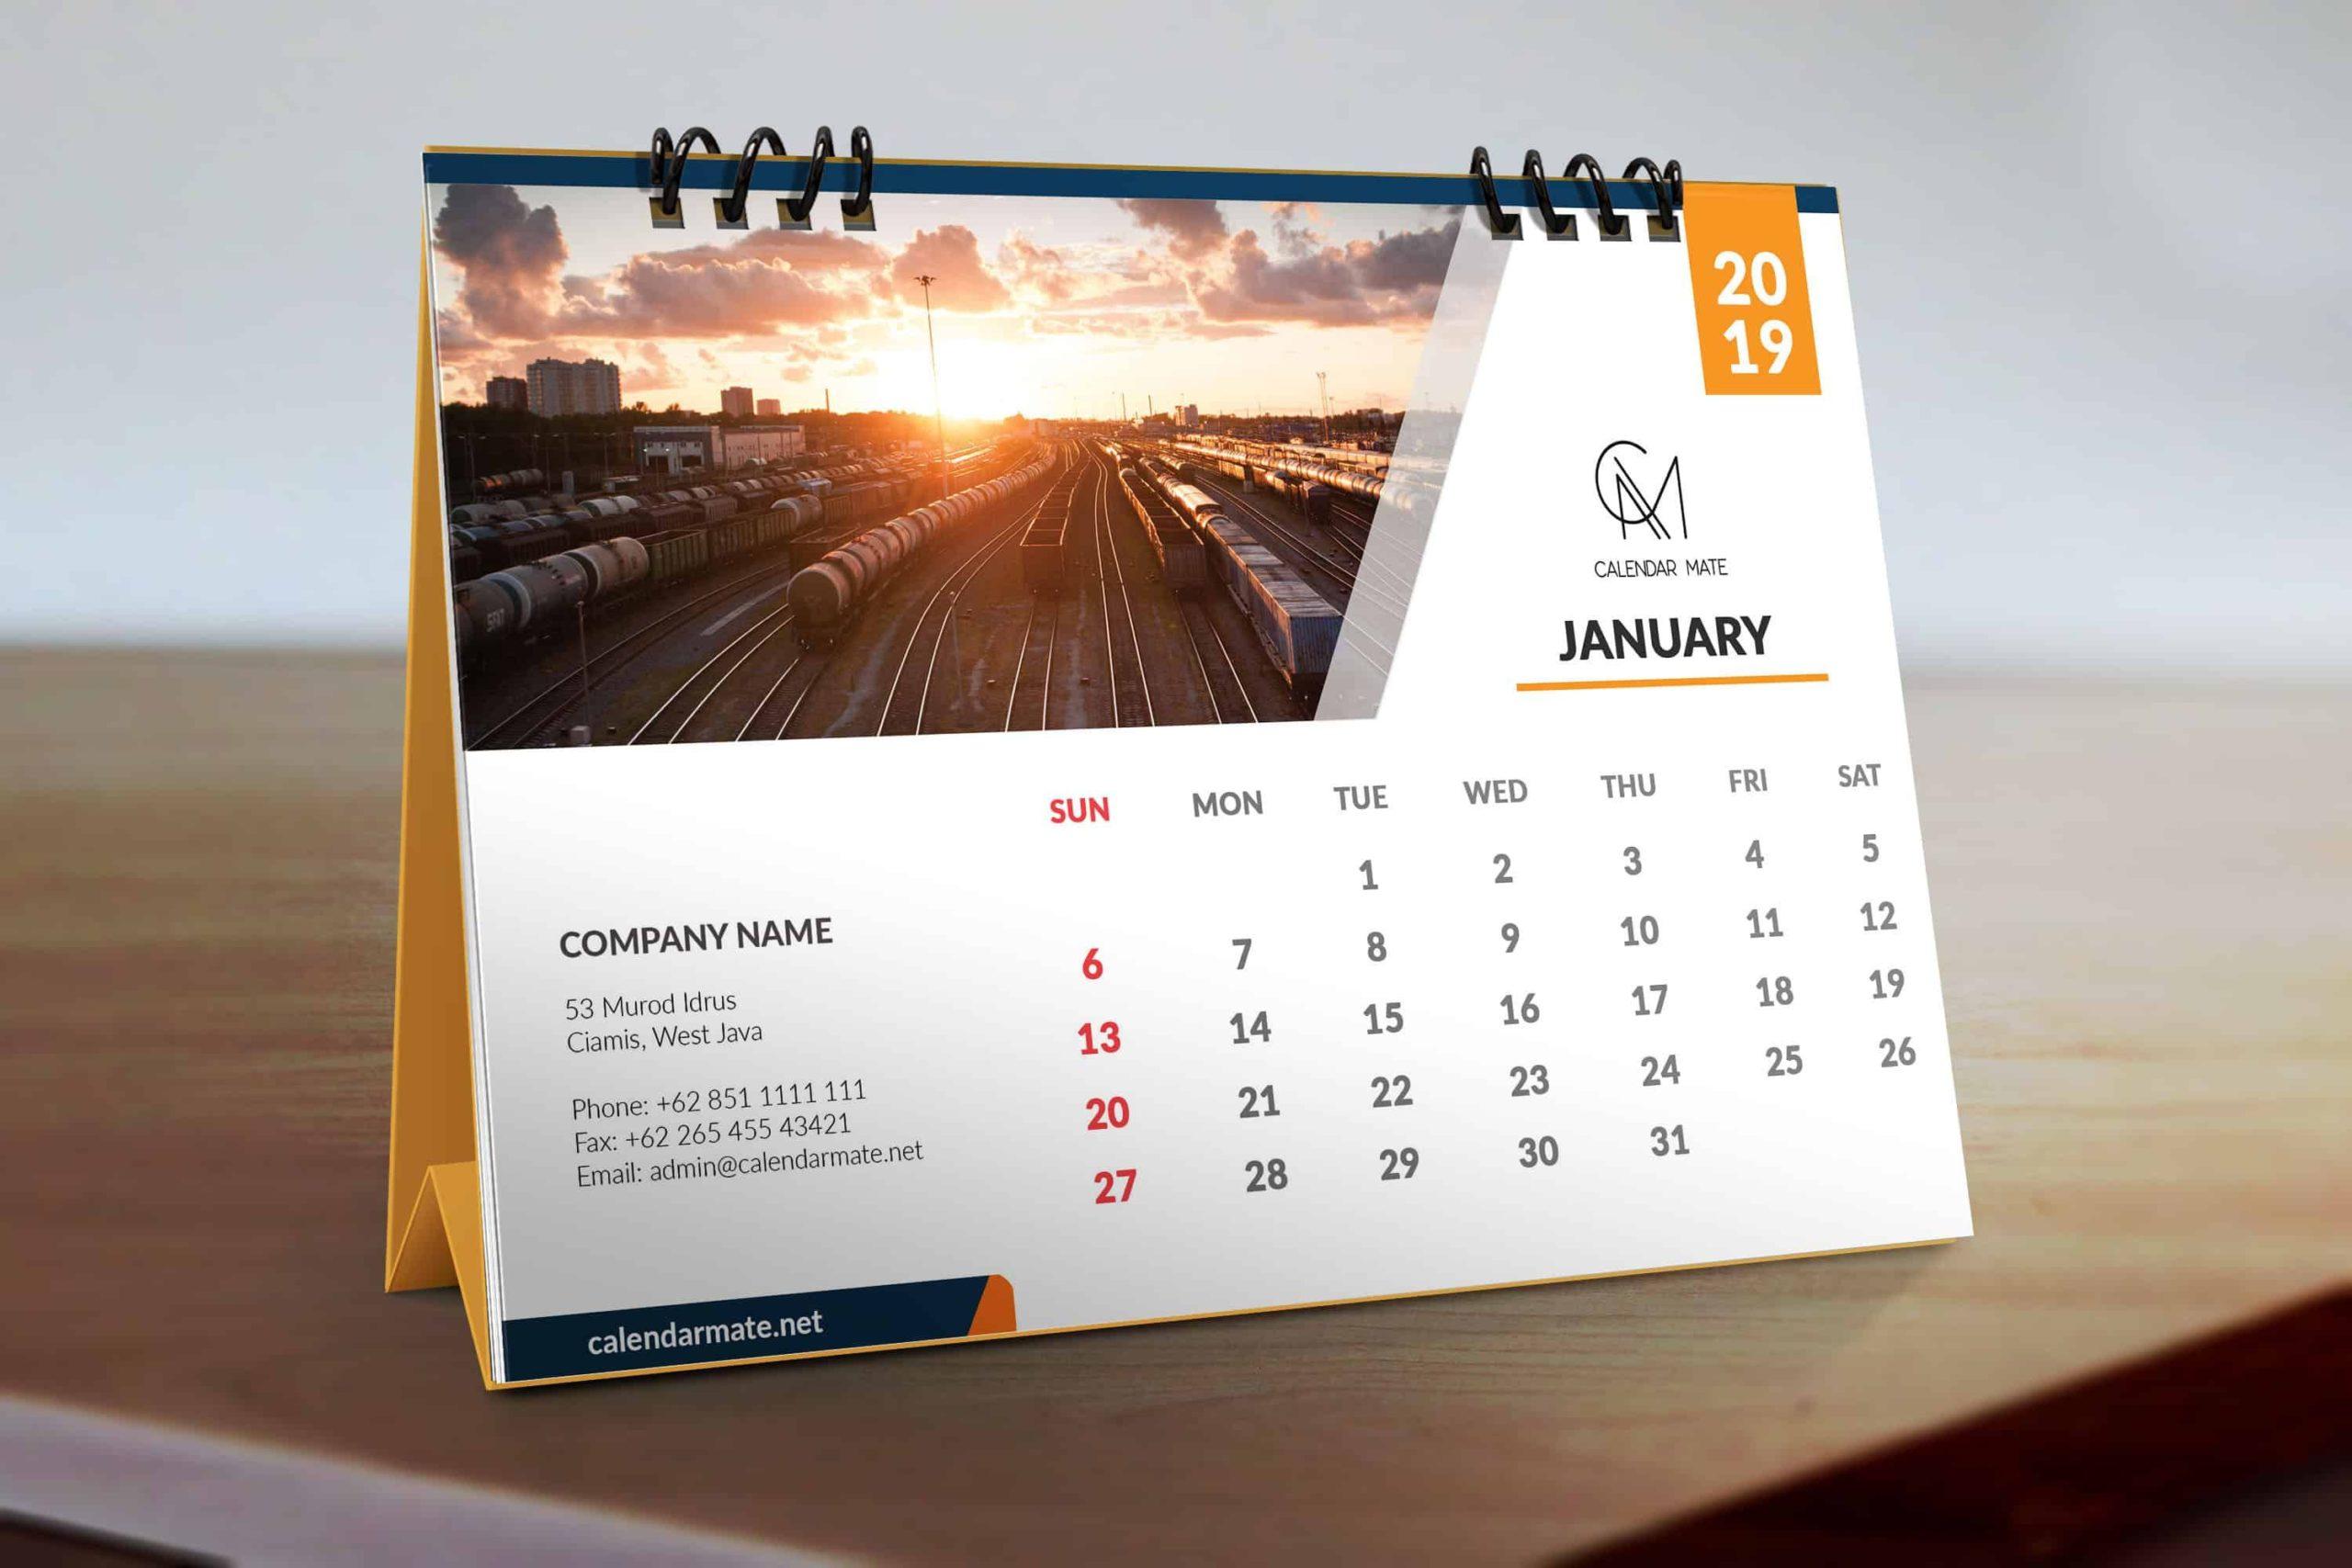 Some fantastic desk calendar from MIS Asia